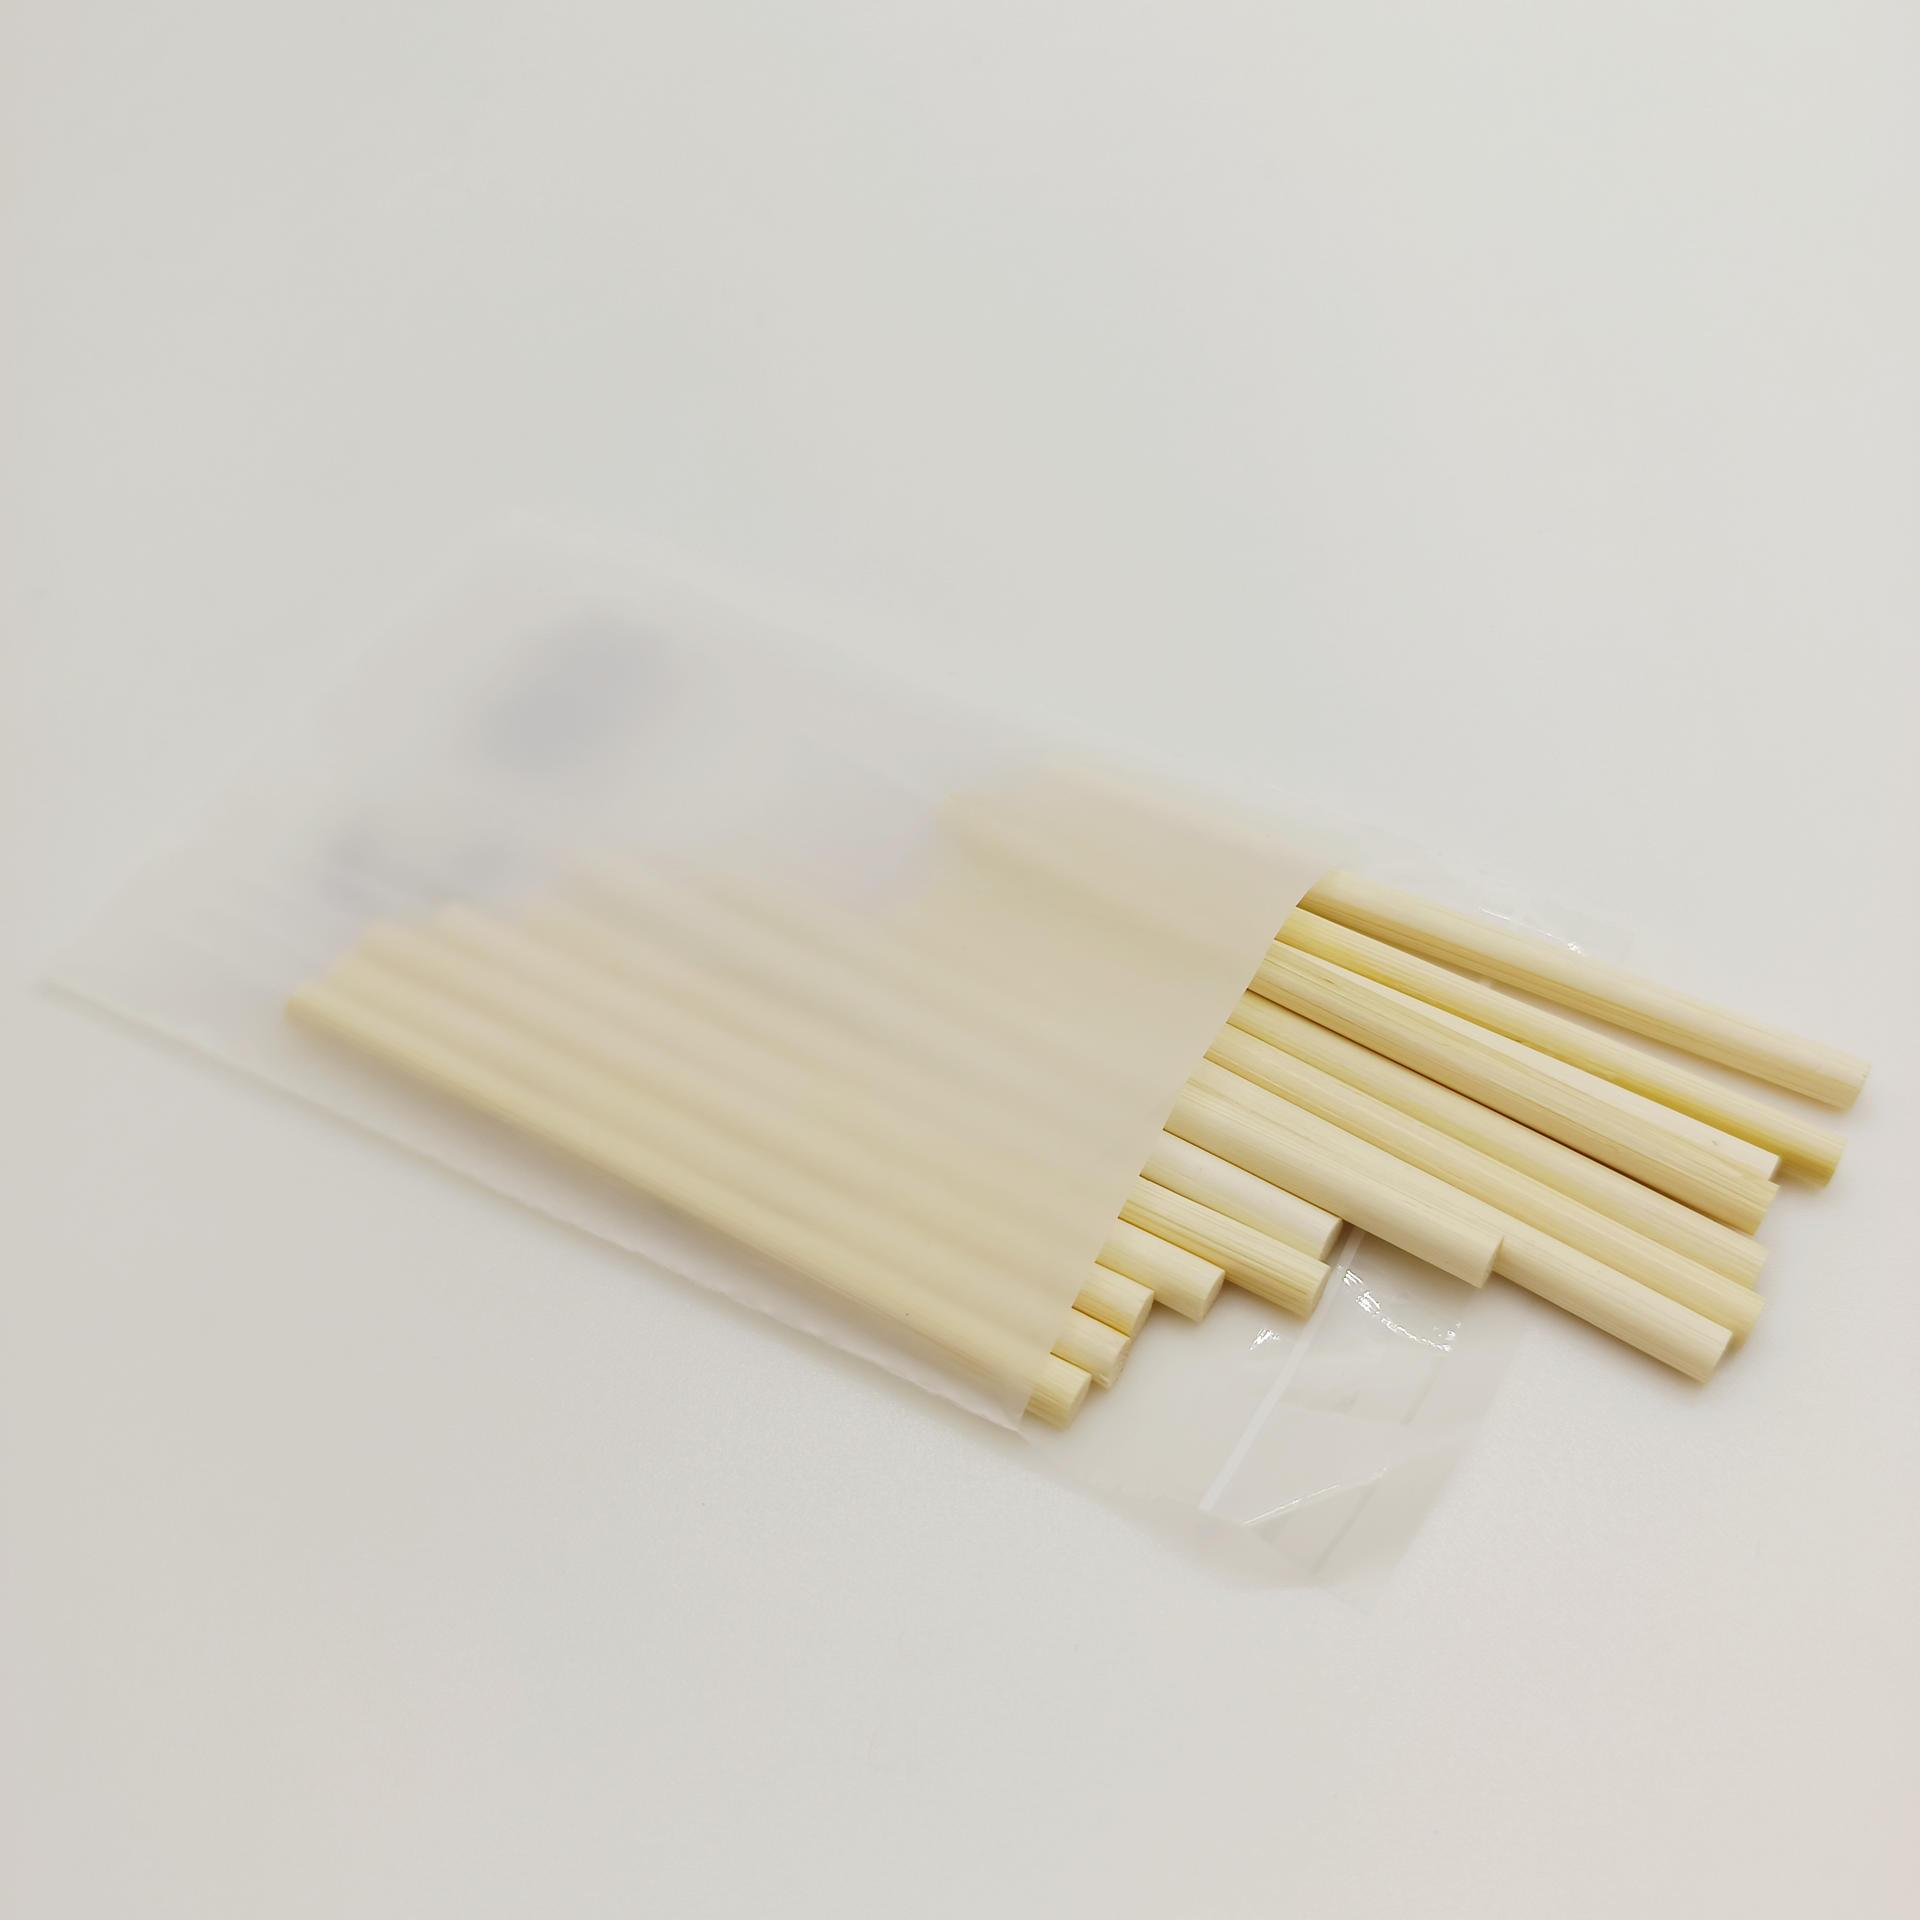 Eco-friendly Disposable Applicator 100pcs/box Regular Size Dental Micro Brush Applicator For Eyelash Brush Micro Fiber Wands